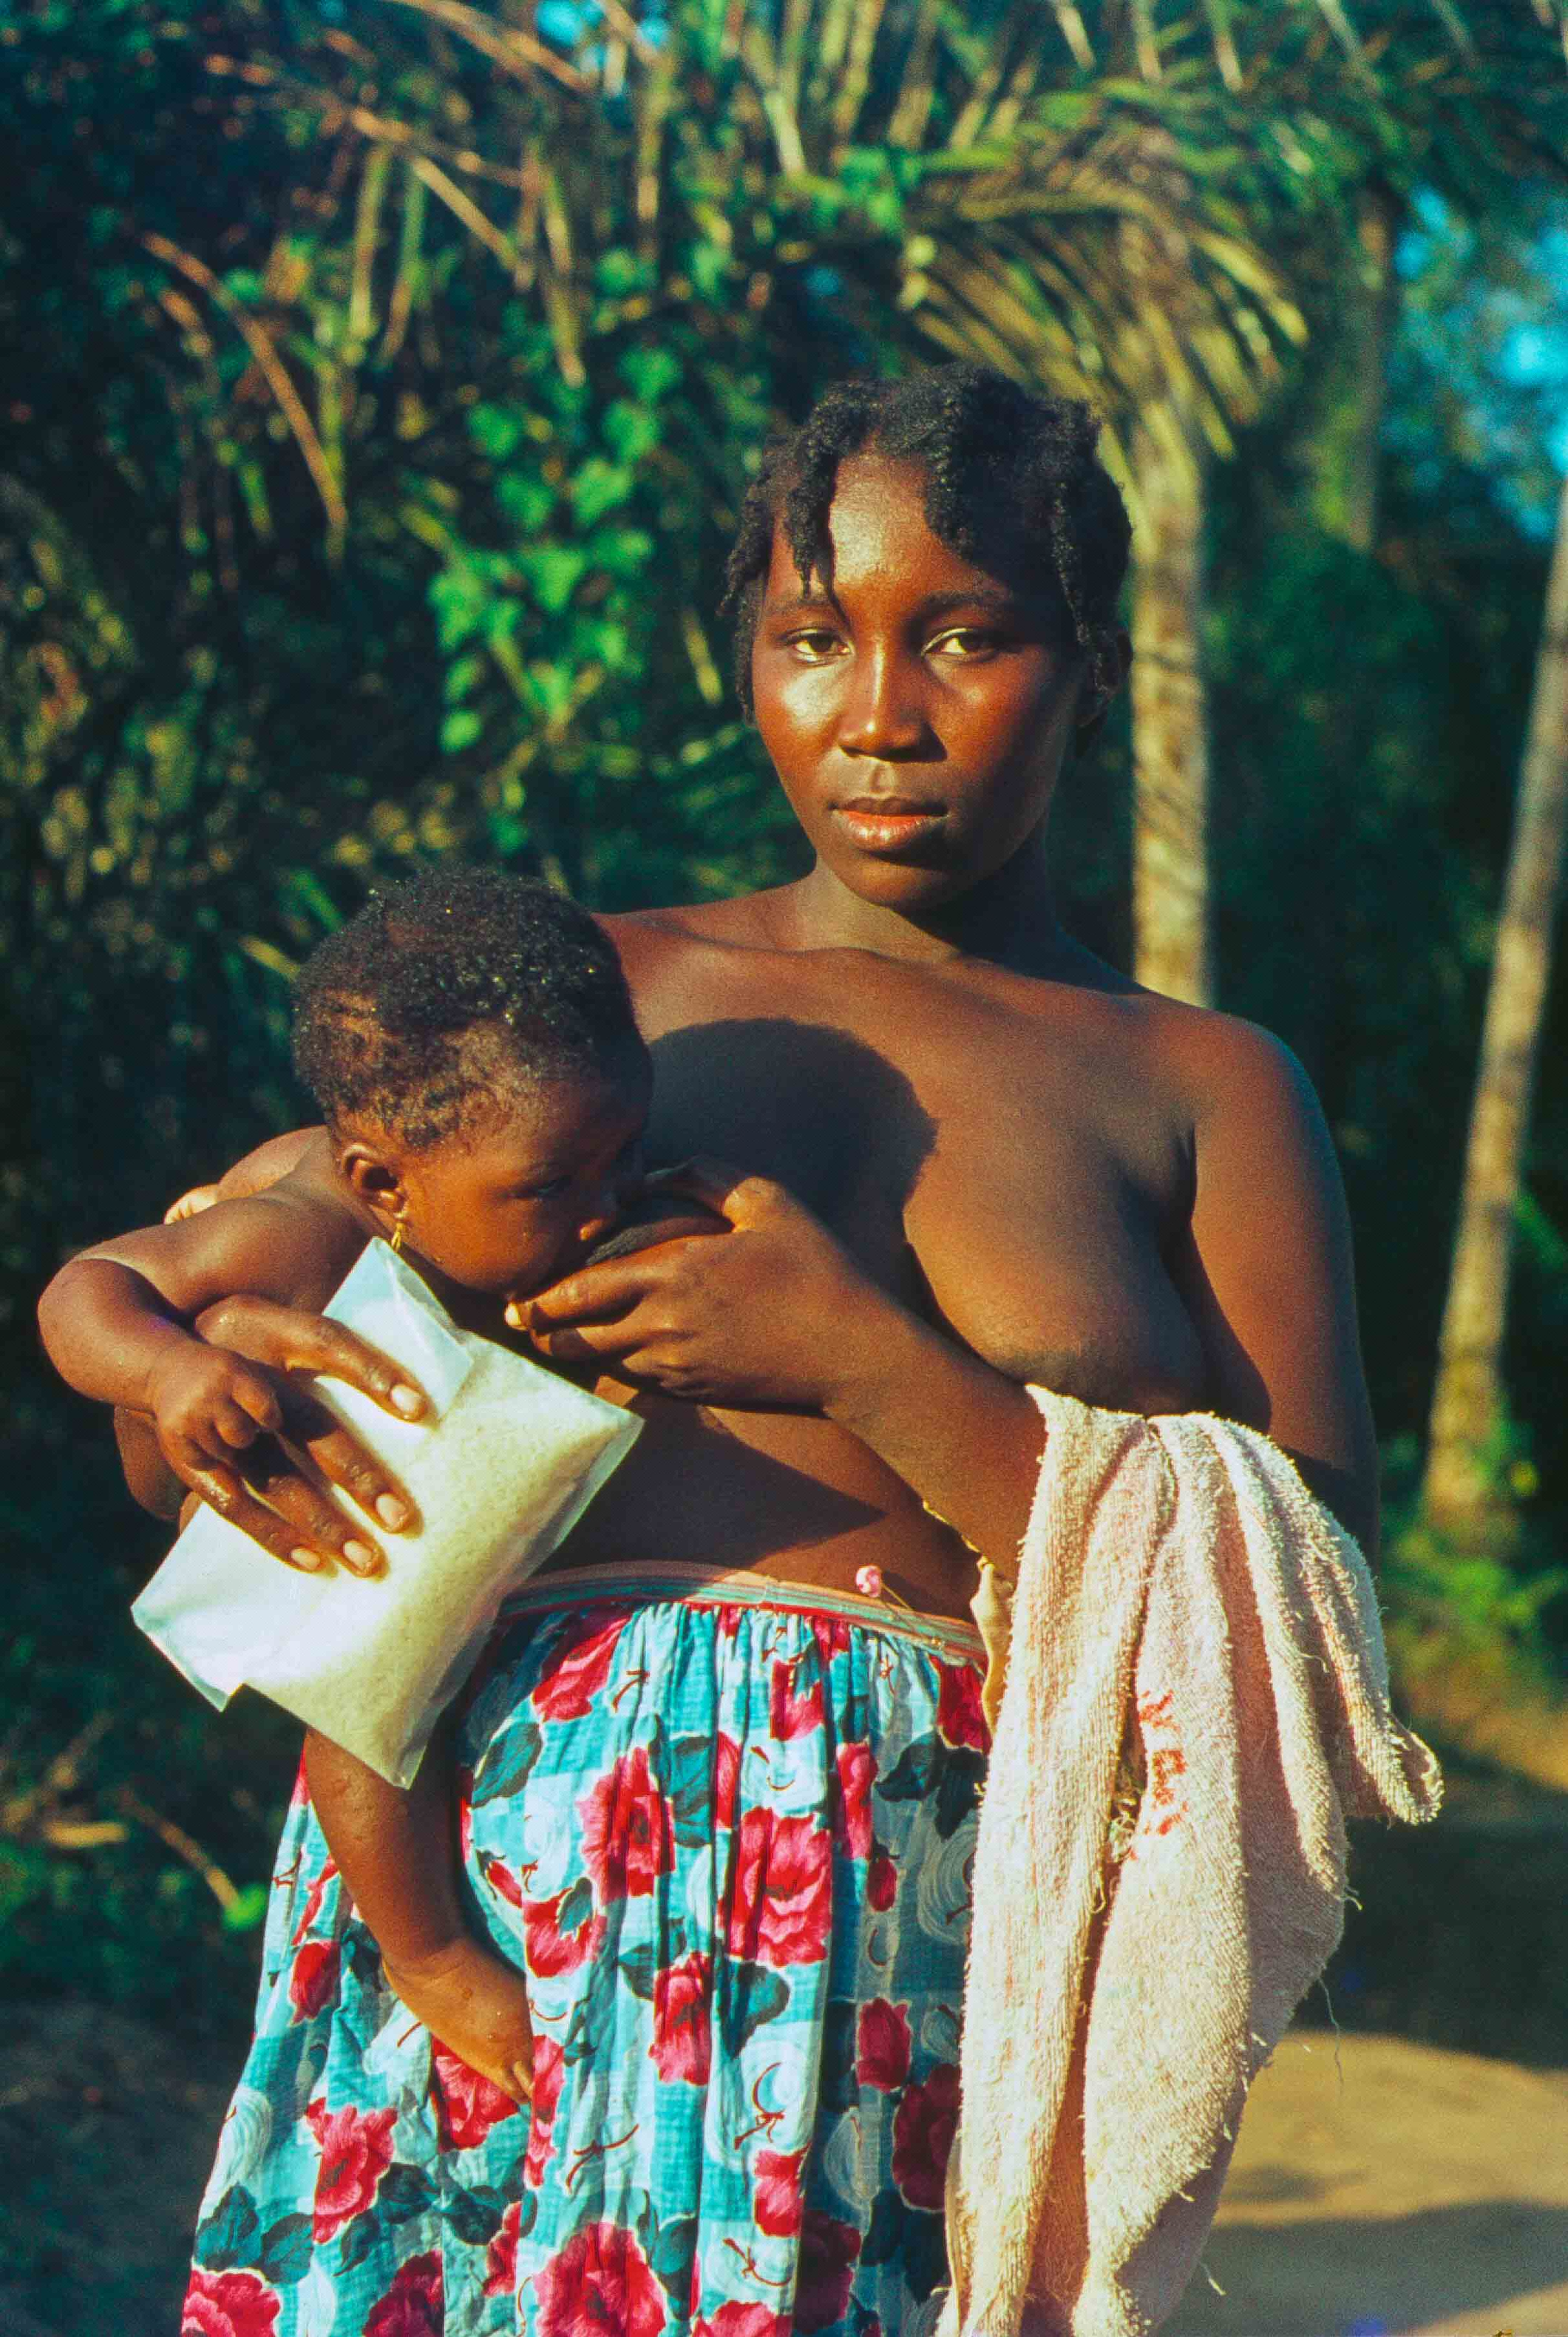 415. Suriname